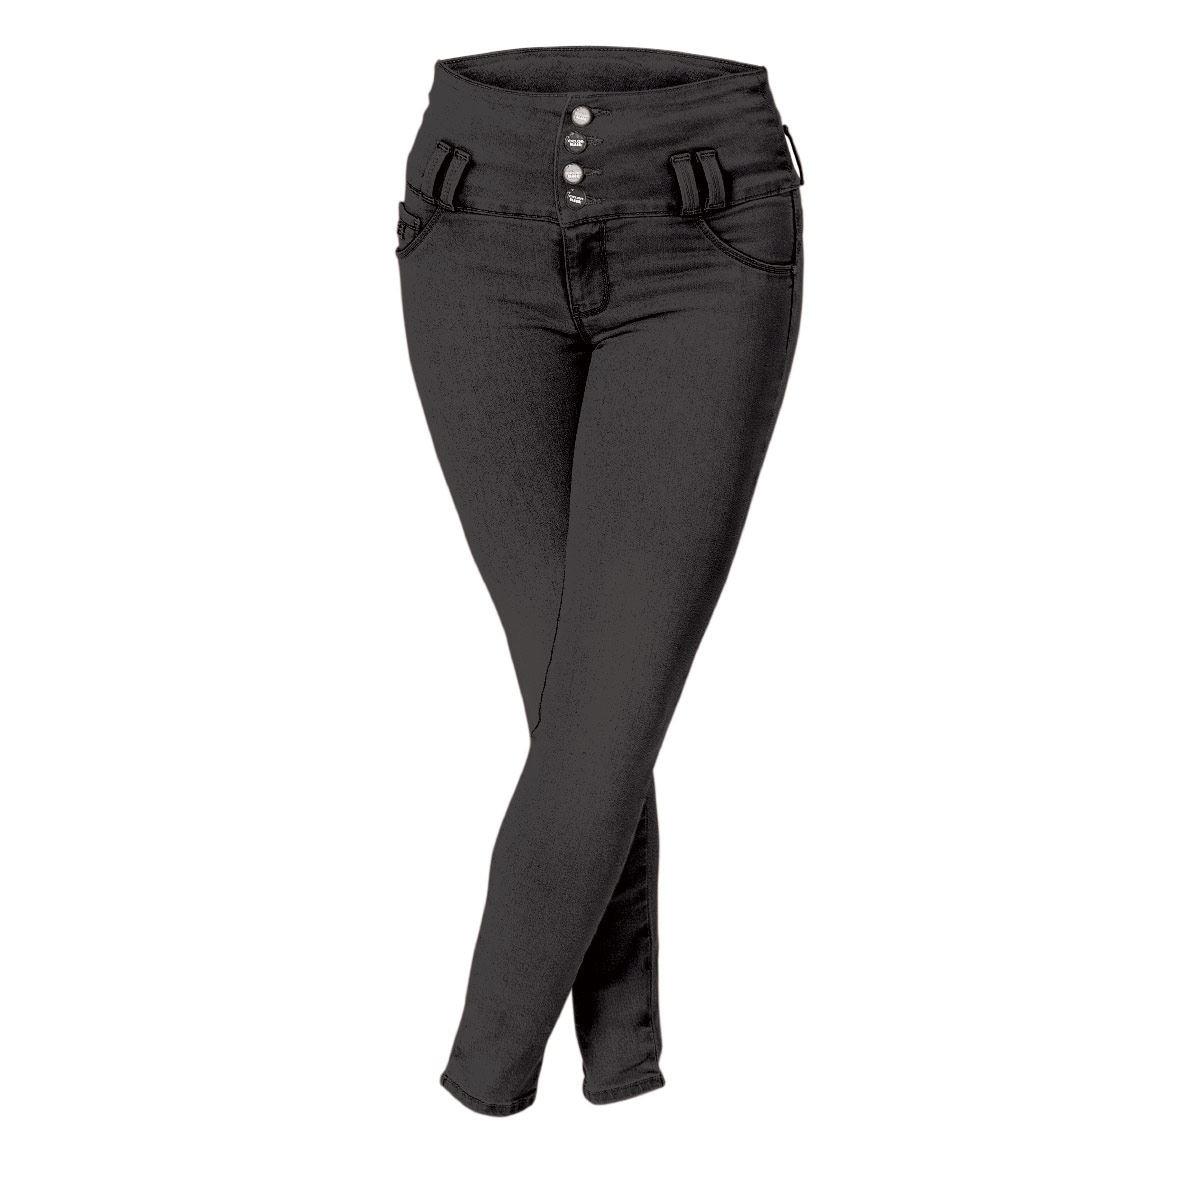 Jeans Moldeaores Tiro Alto Negro Comfy Jeans